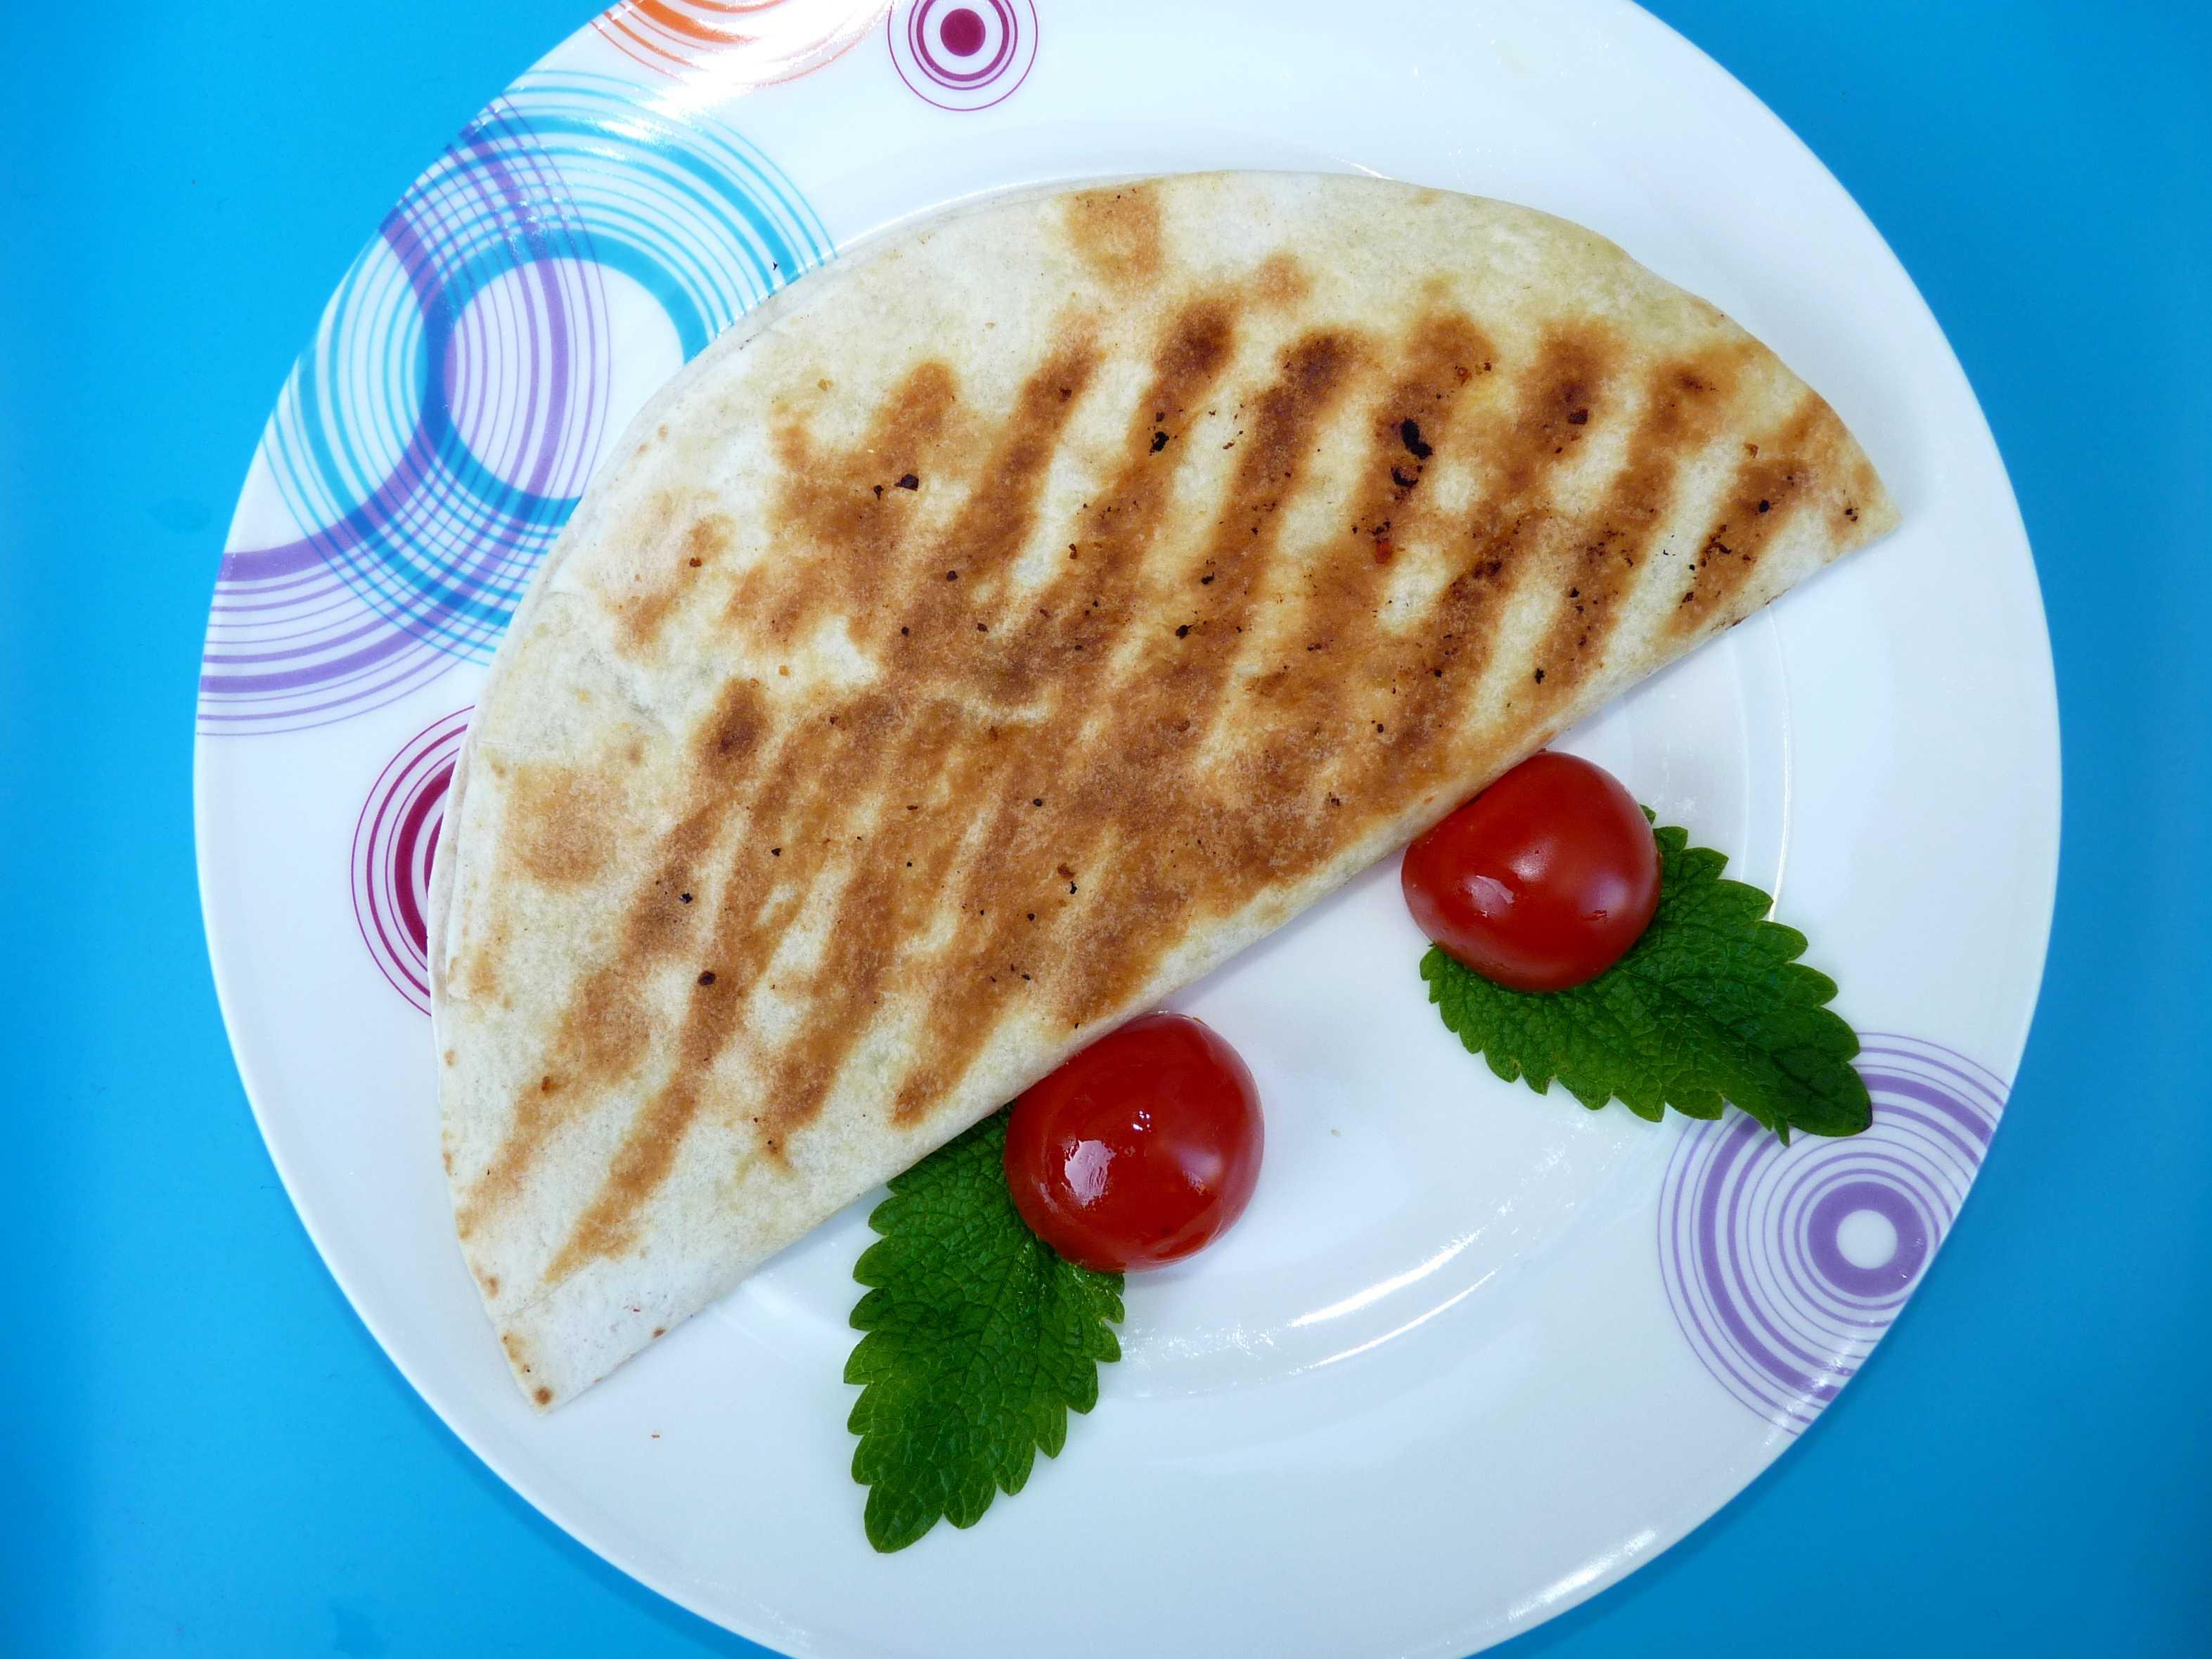 TortillasGefuelltVomGrill (9)